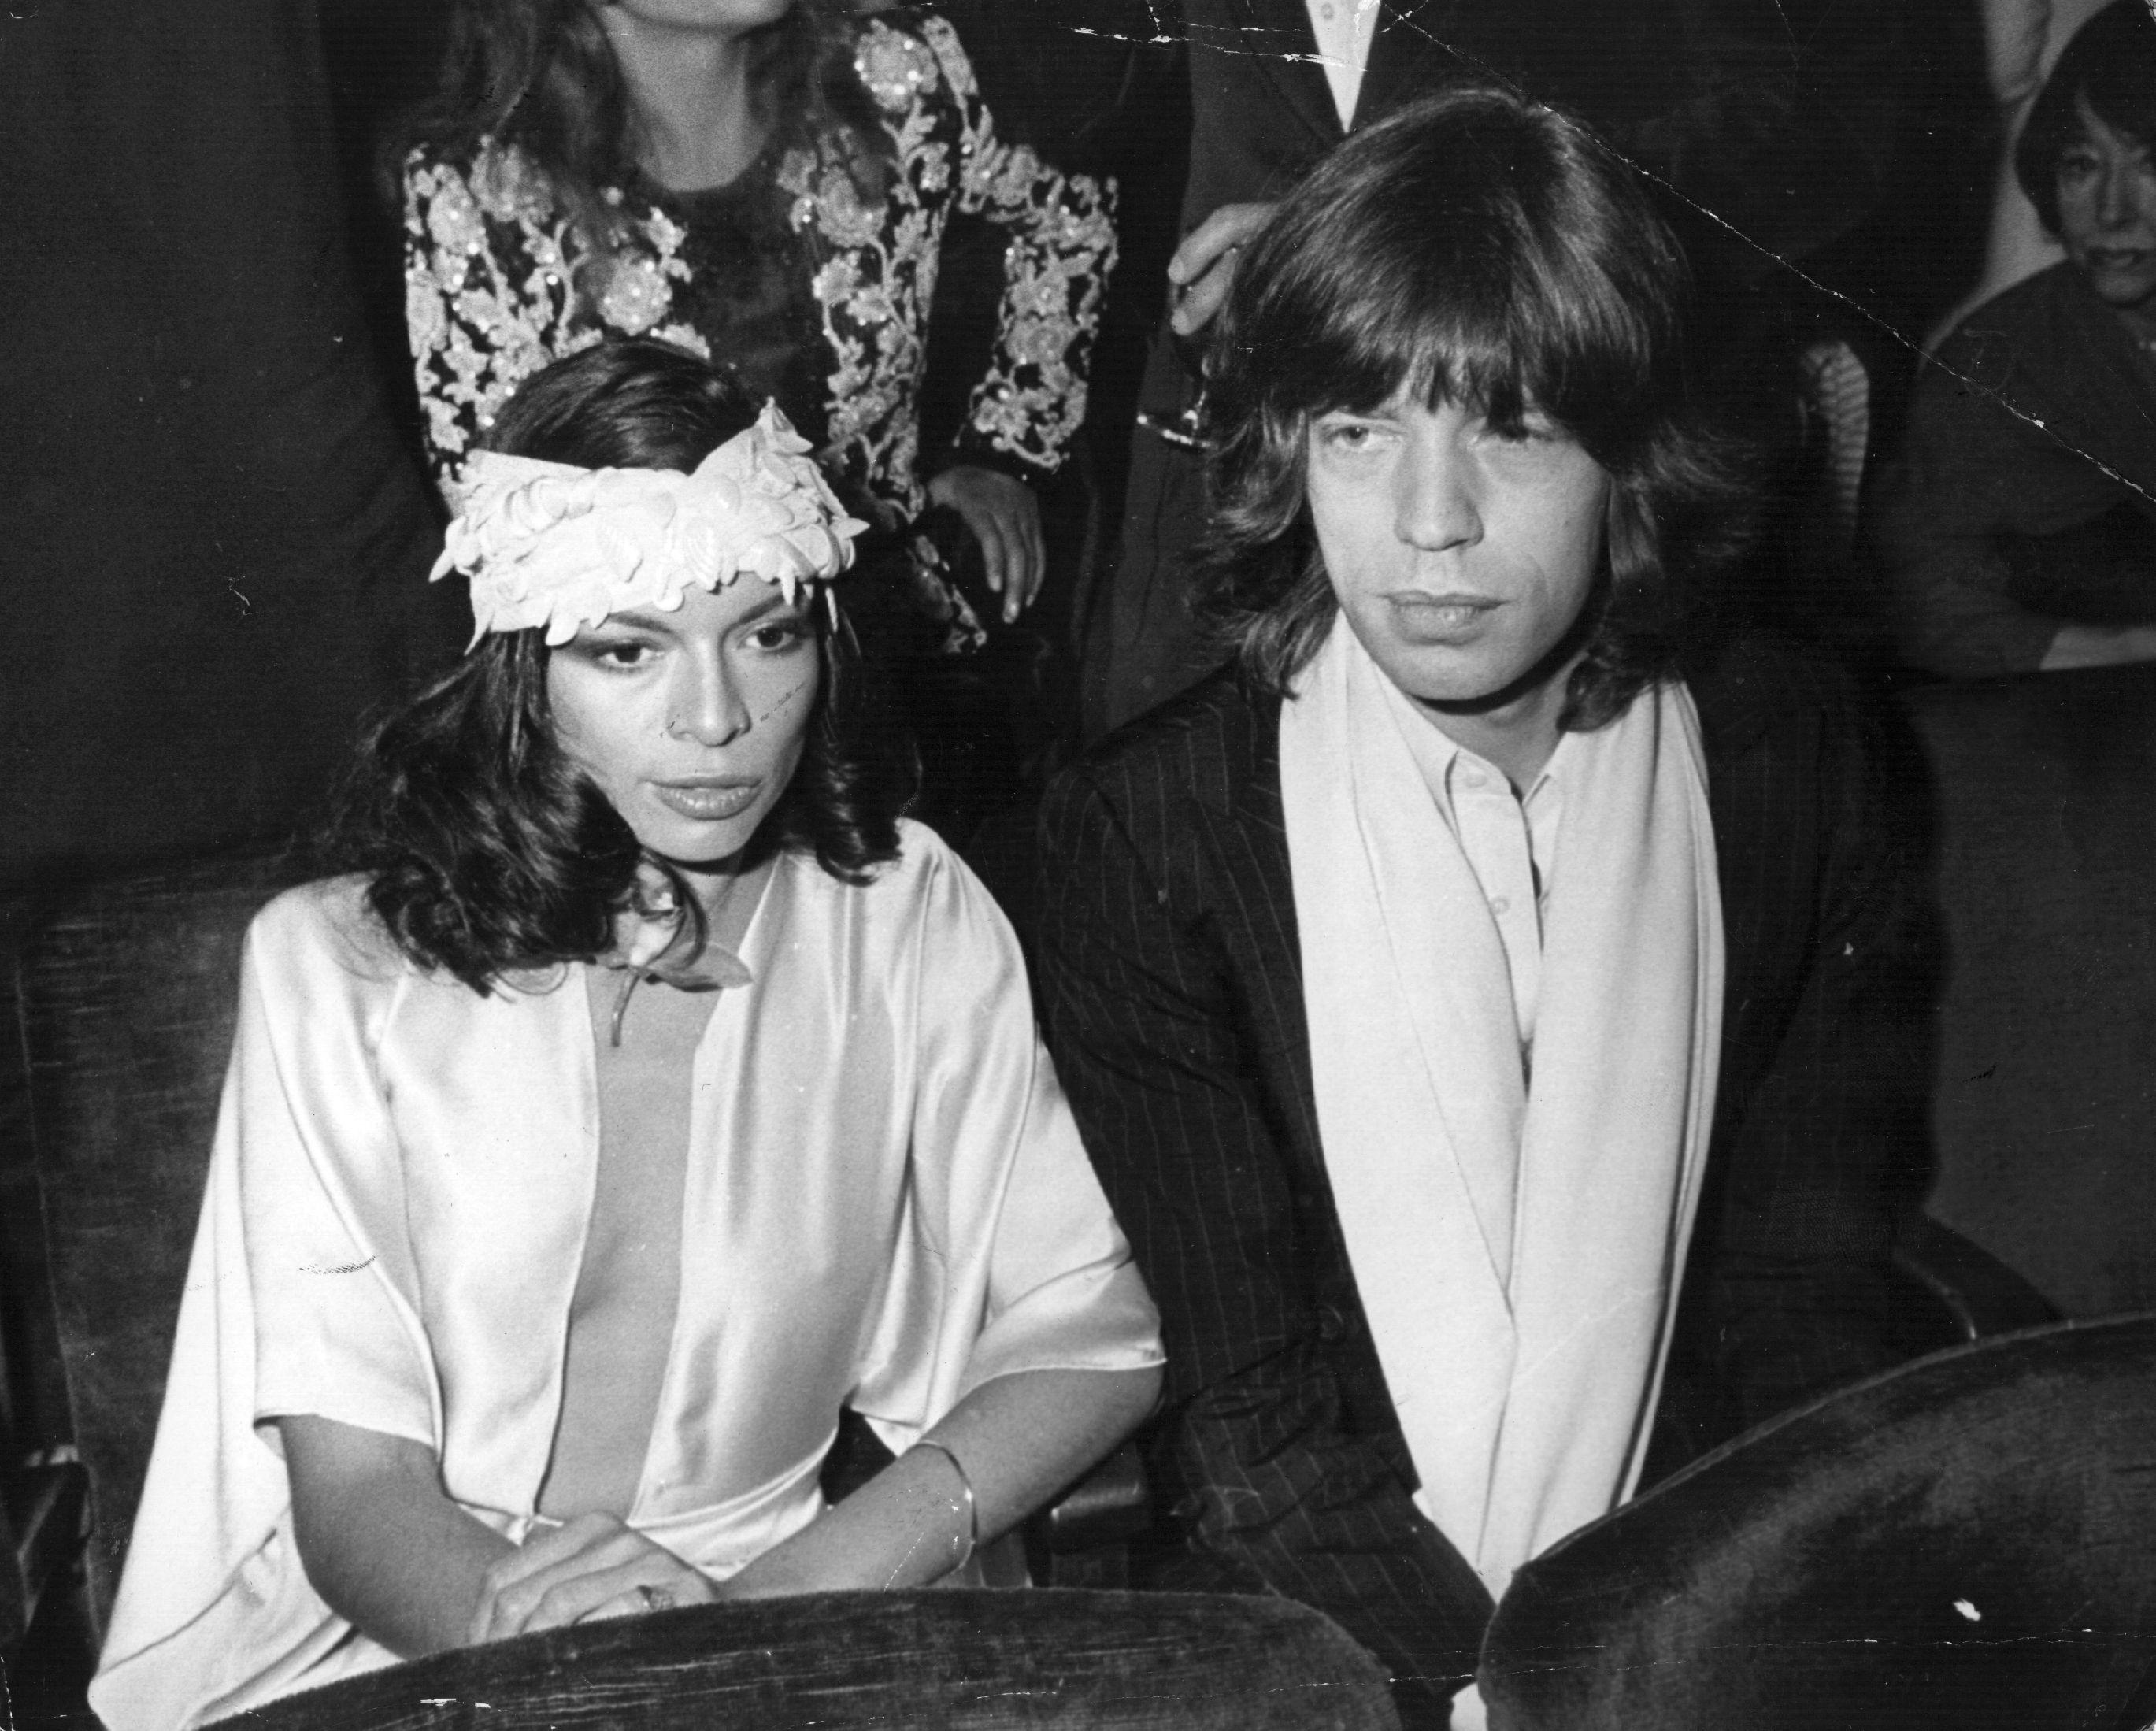 Bianca Jagger Studio 54